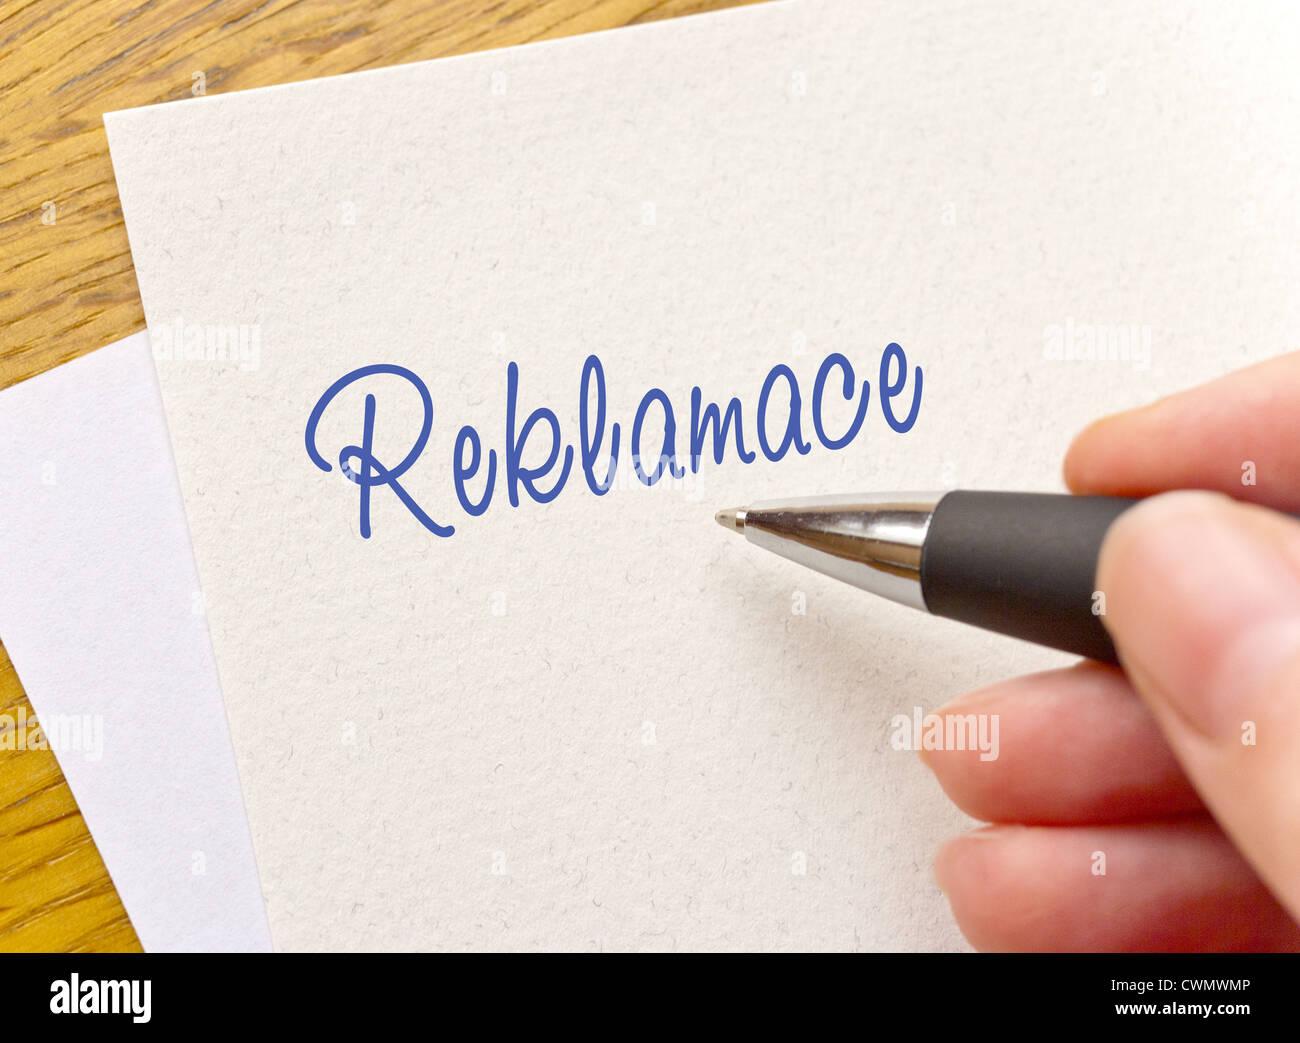 Czech writting - reklamace headline - Reclamation - Stock Image